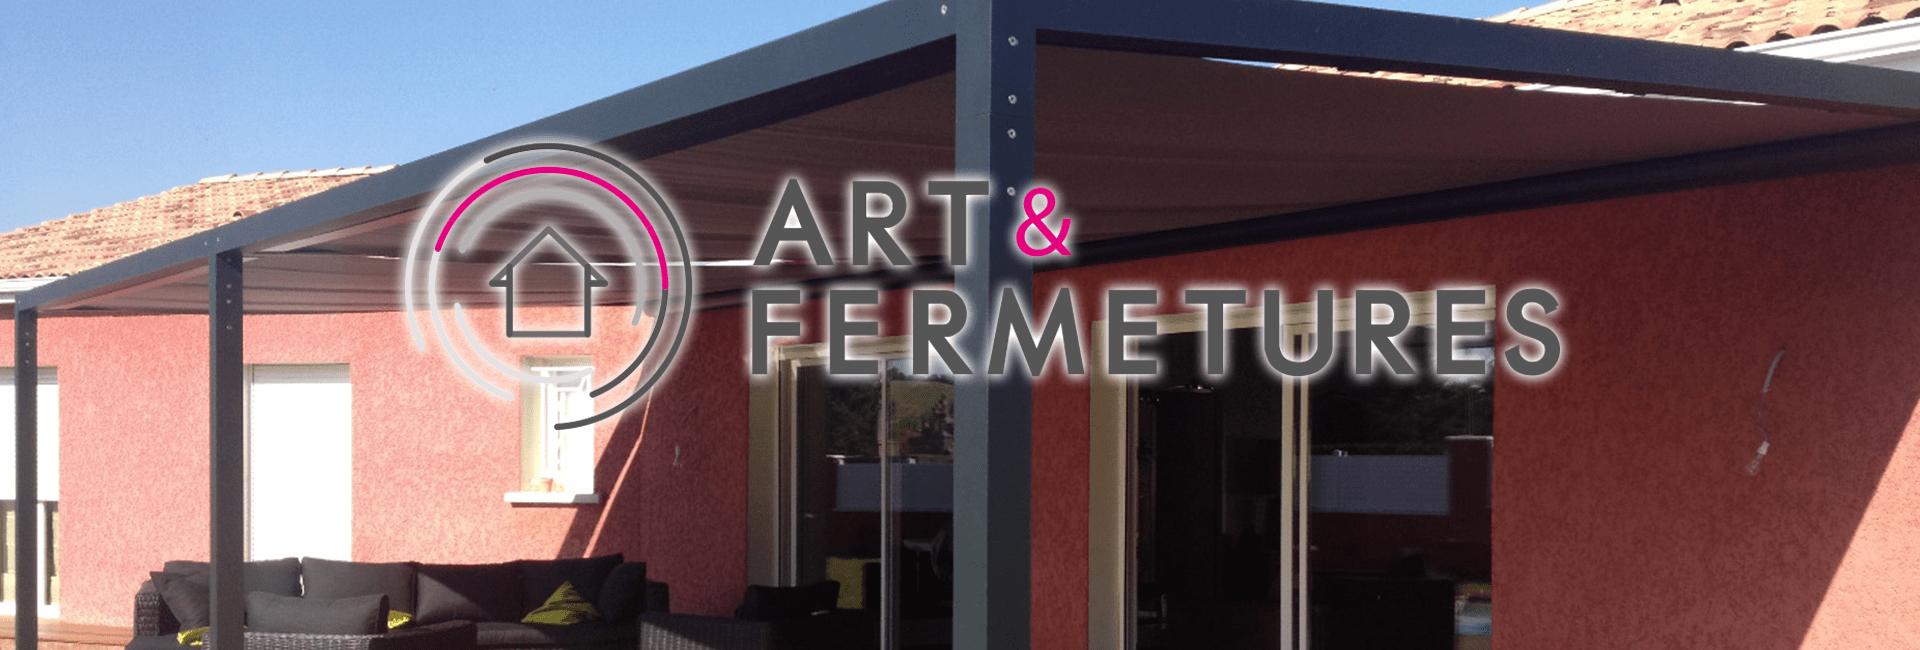 art fermetures pose de portes portails fenetres lyon. Black Bedroom Furniture Sets. Home Design Ideas